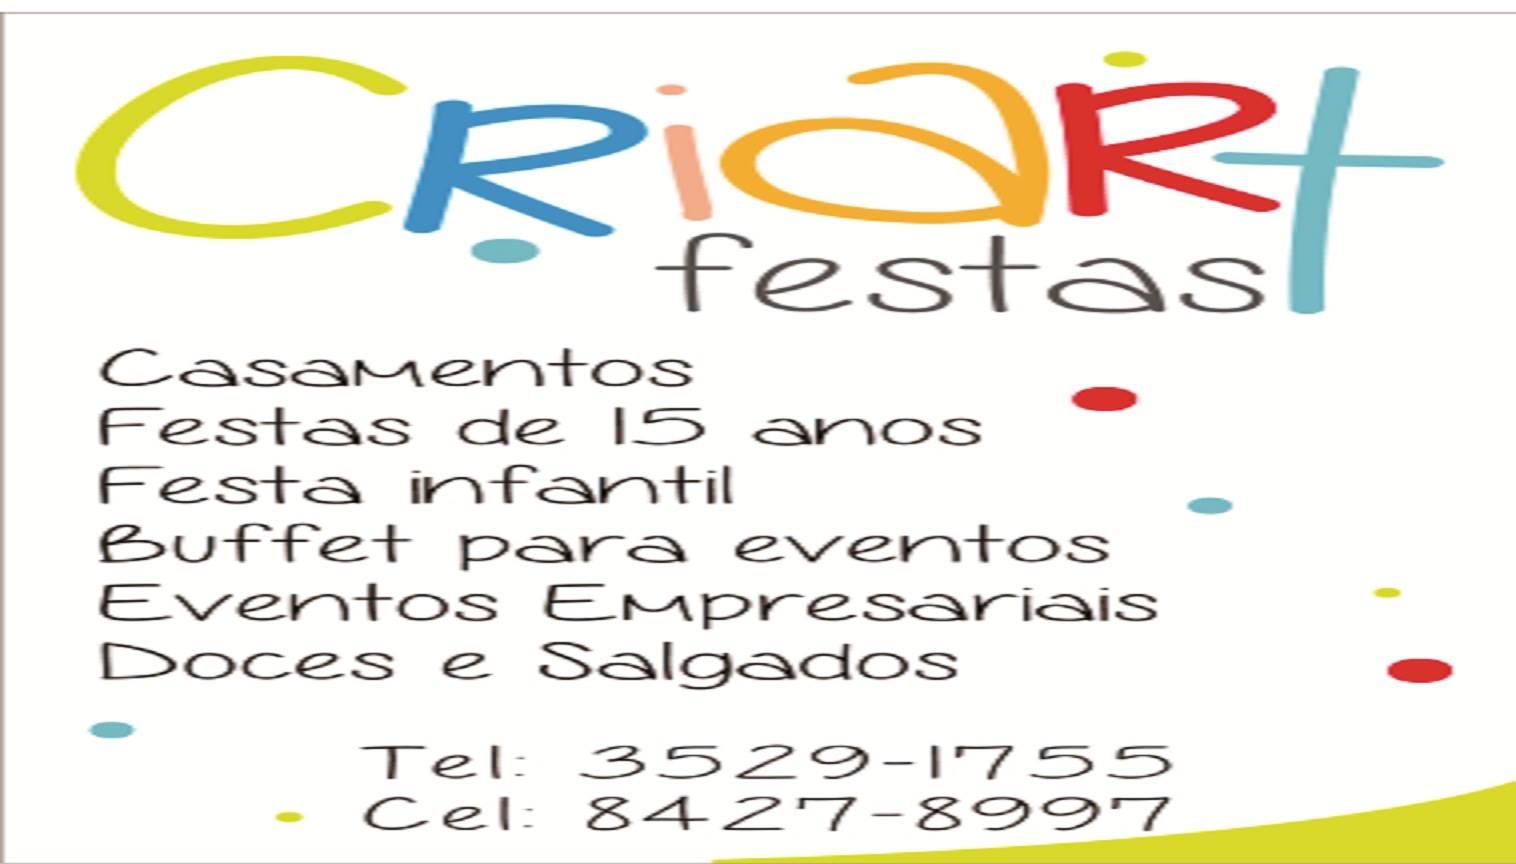 CRIART FESTAS